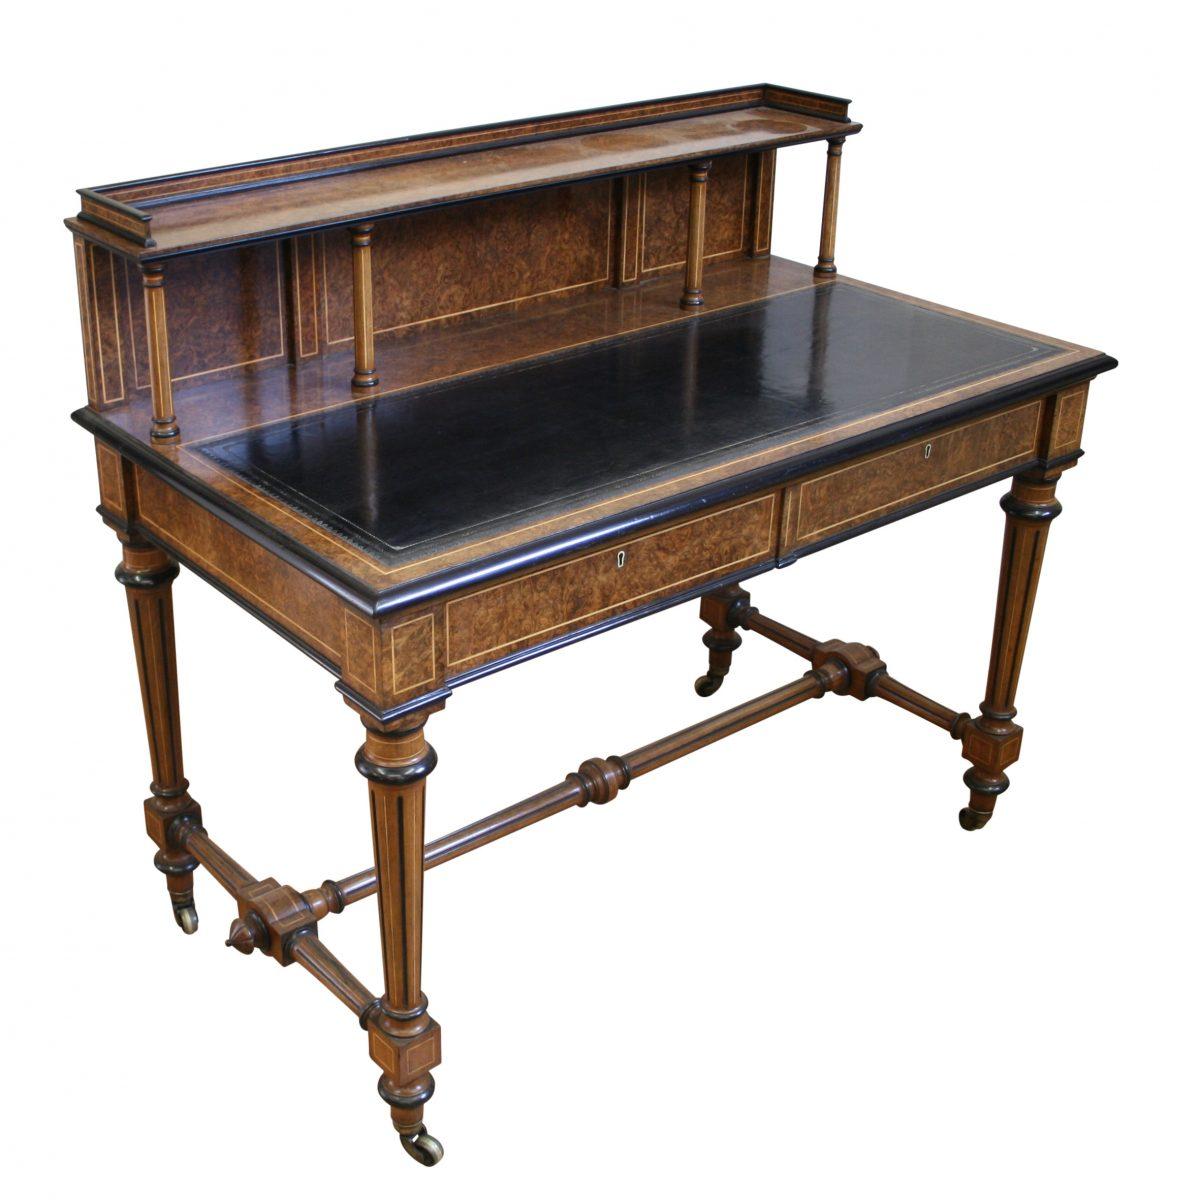 An antique Victorian Burr Walnut writing desk Williams